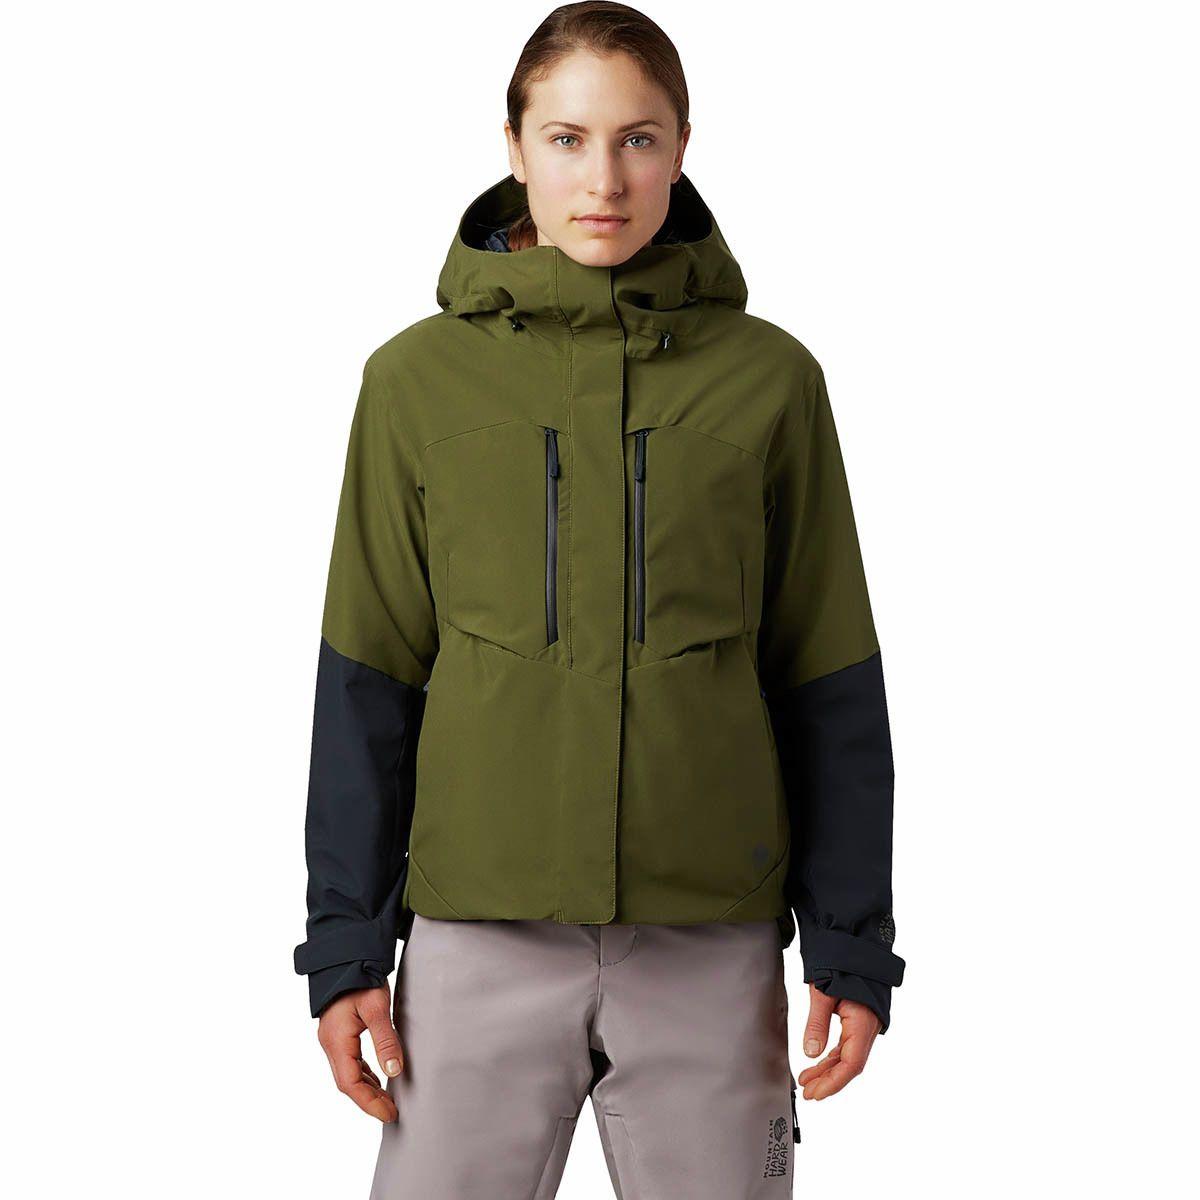 Firefall 2 Insulated Jacket - Women